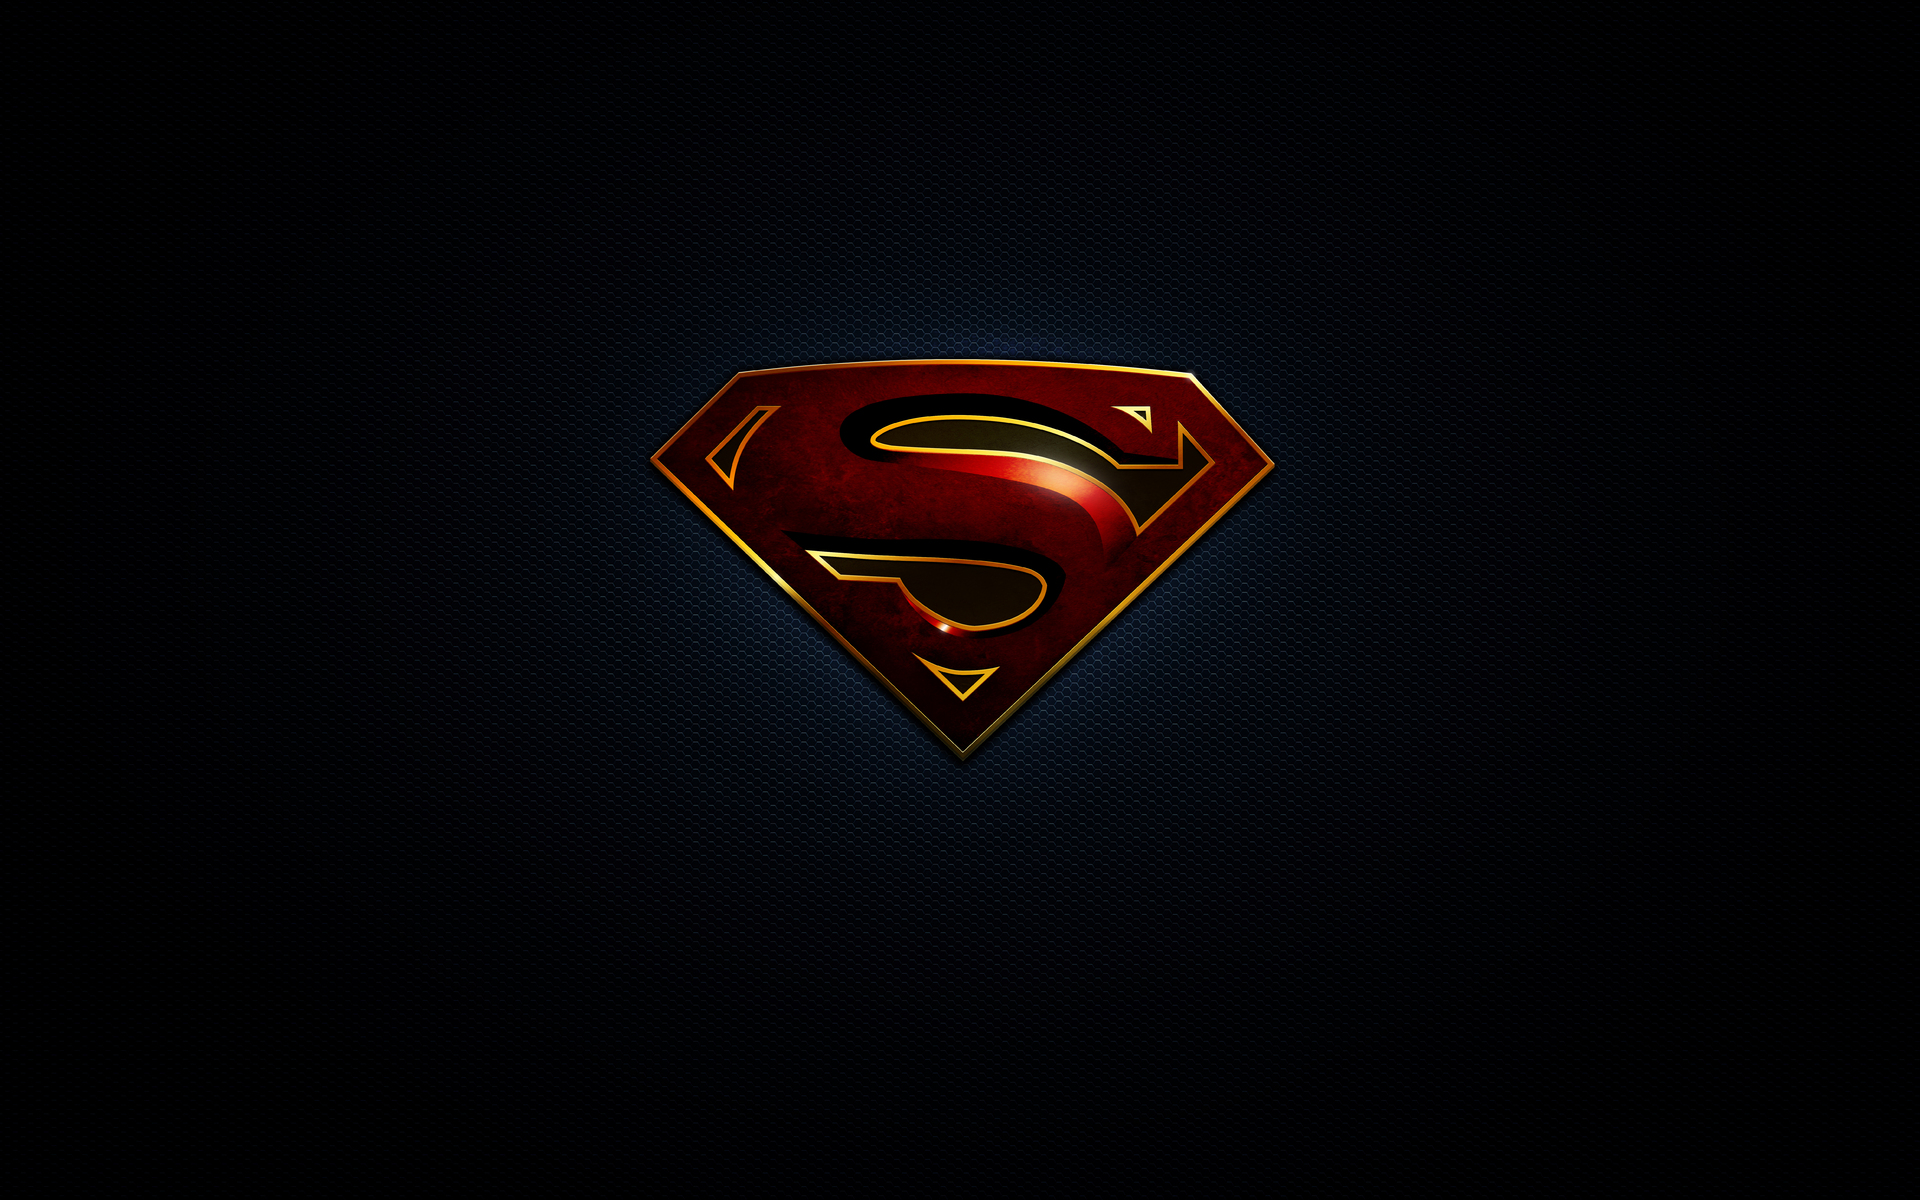 superman-logo-10k-vx.jpg